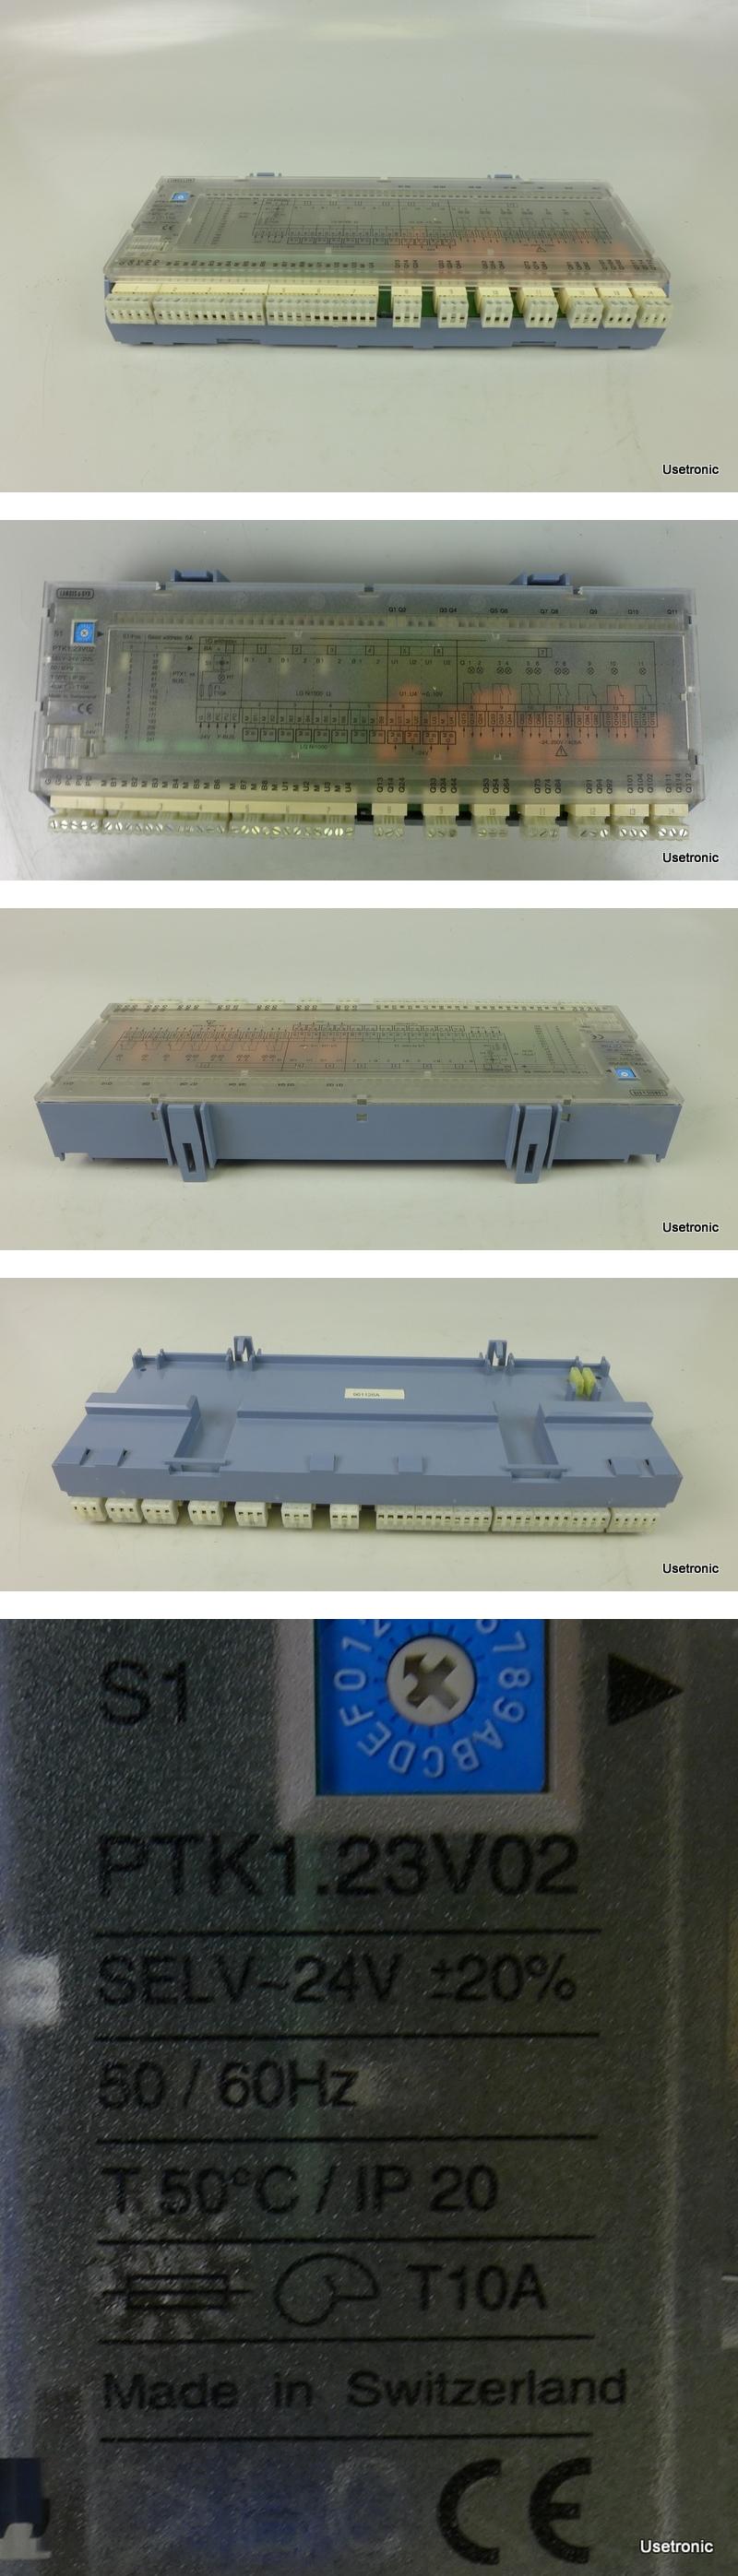 Siemens Landis Gyr PTK1.23